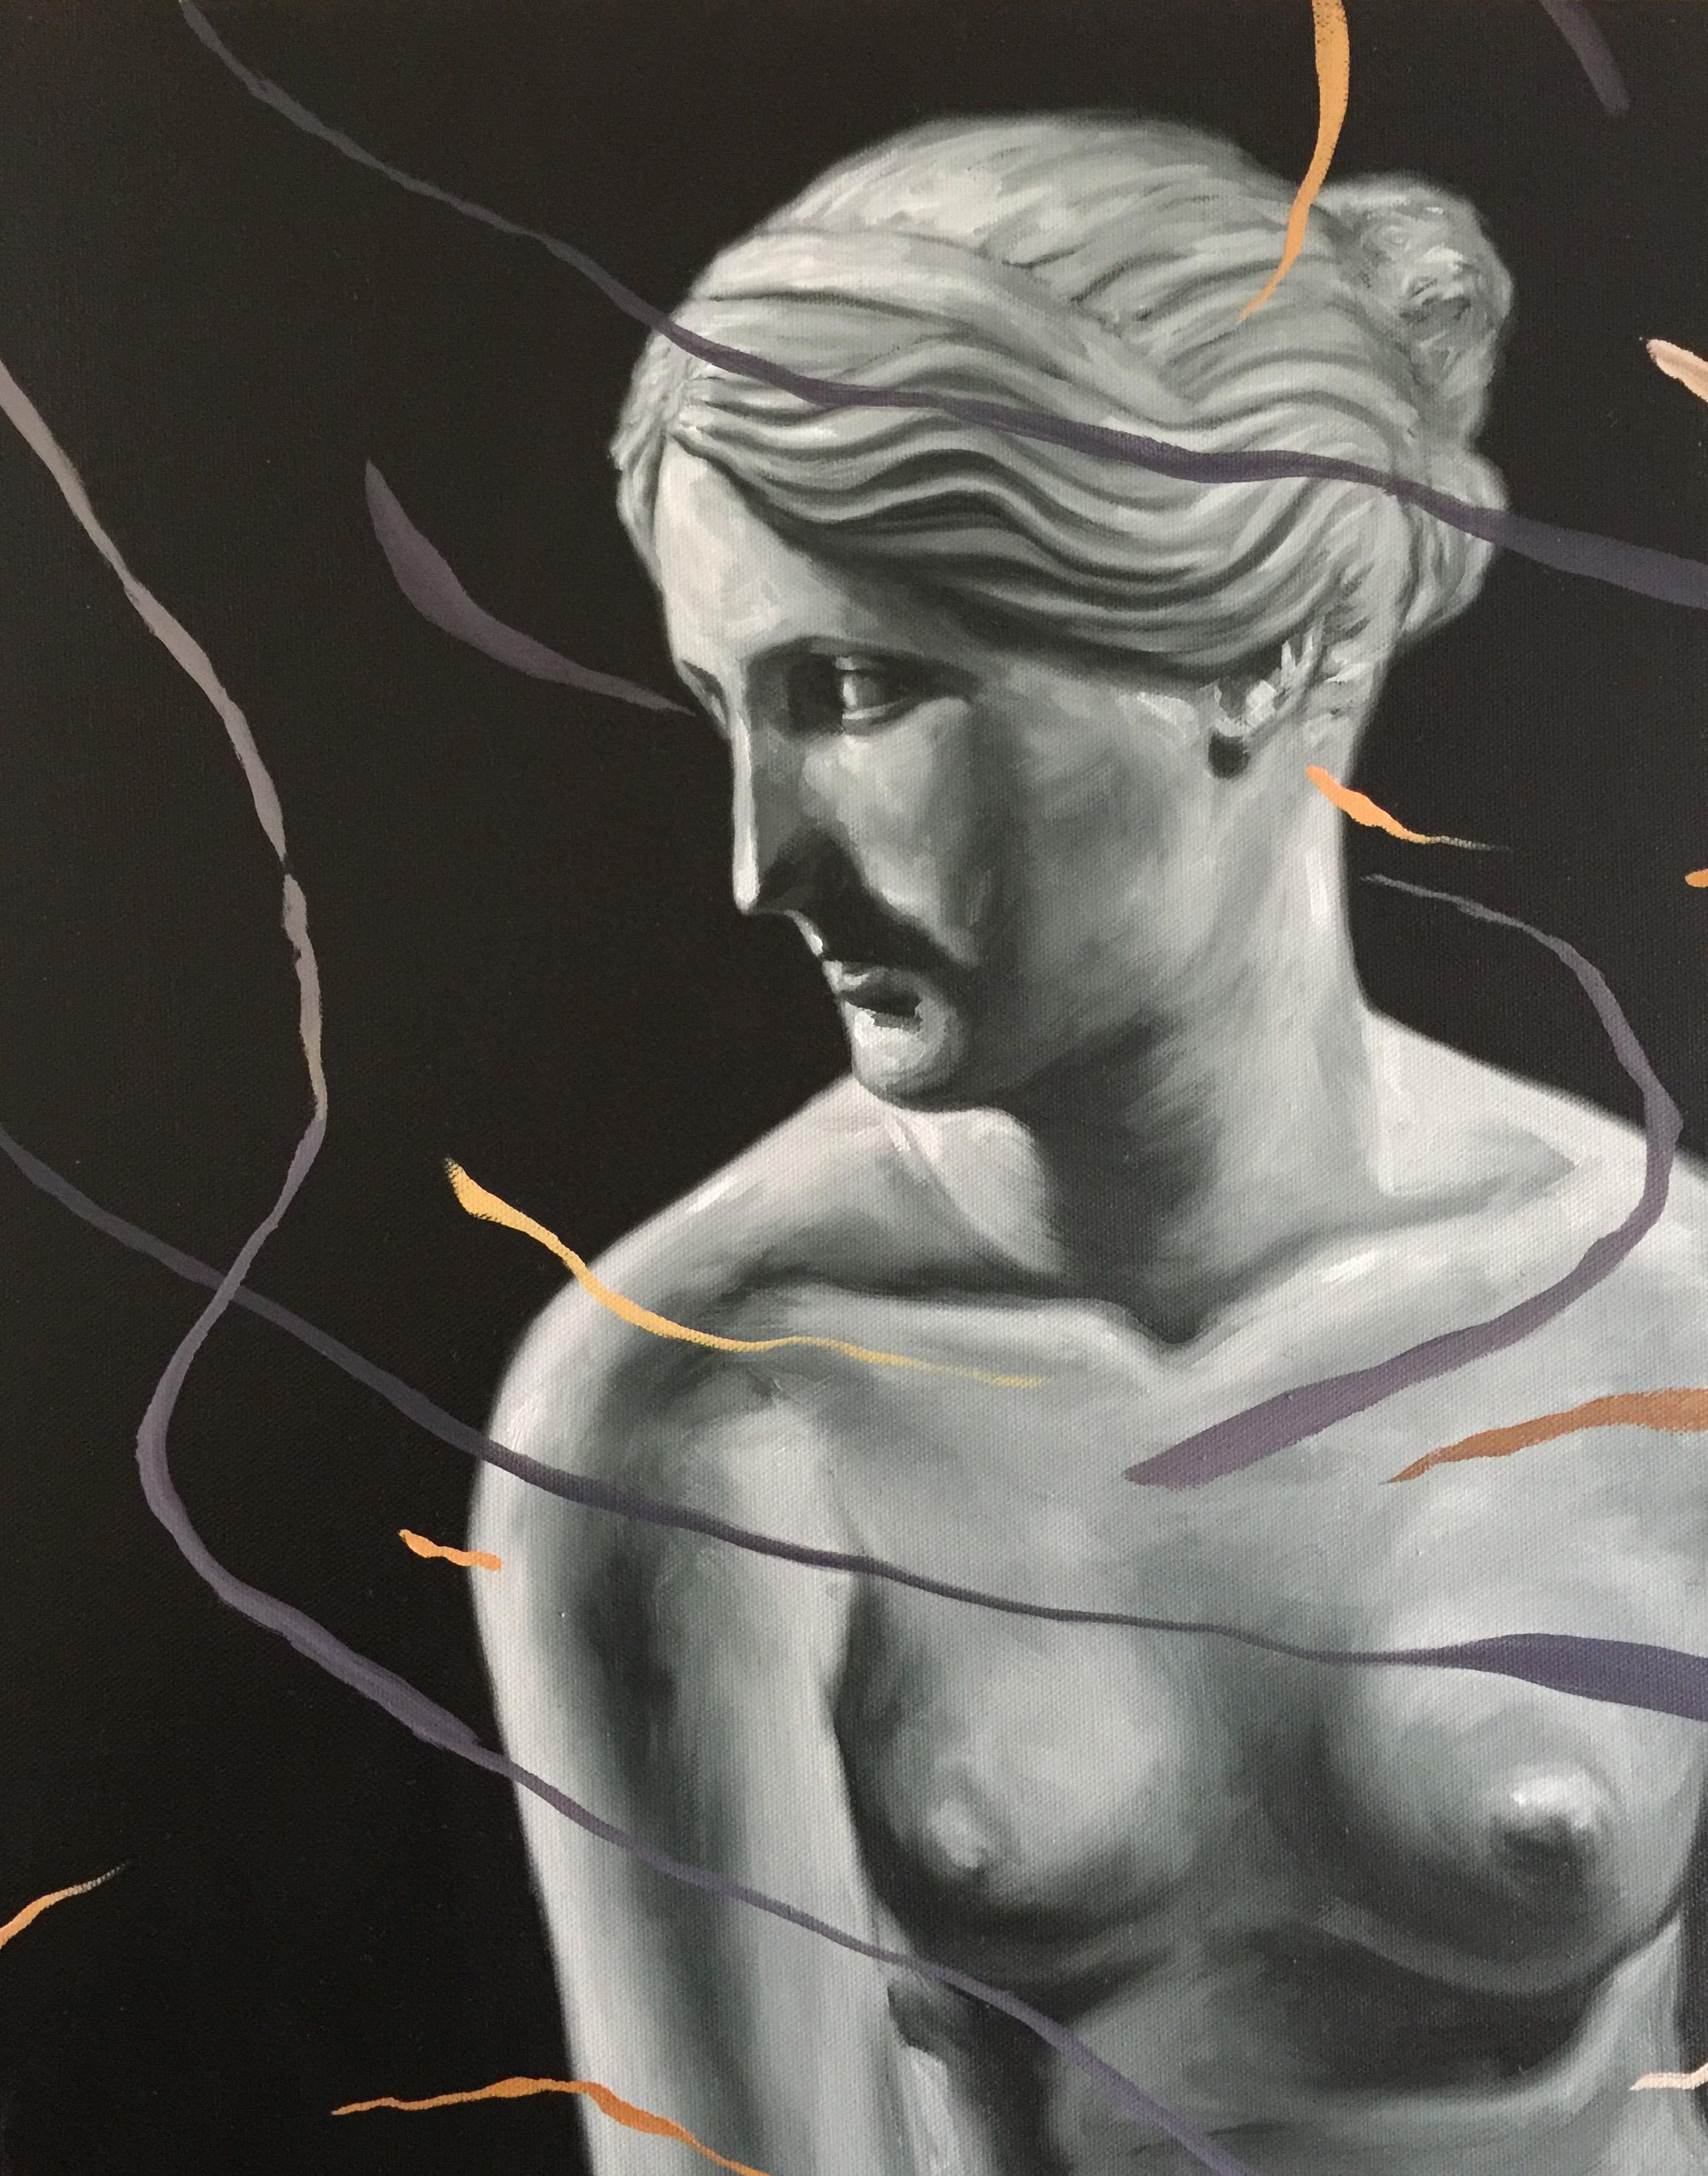 Gabriele Bonato, from the serie CRACKS, oil on canvas, 50 x 35cm